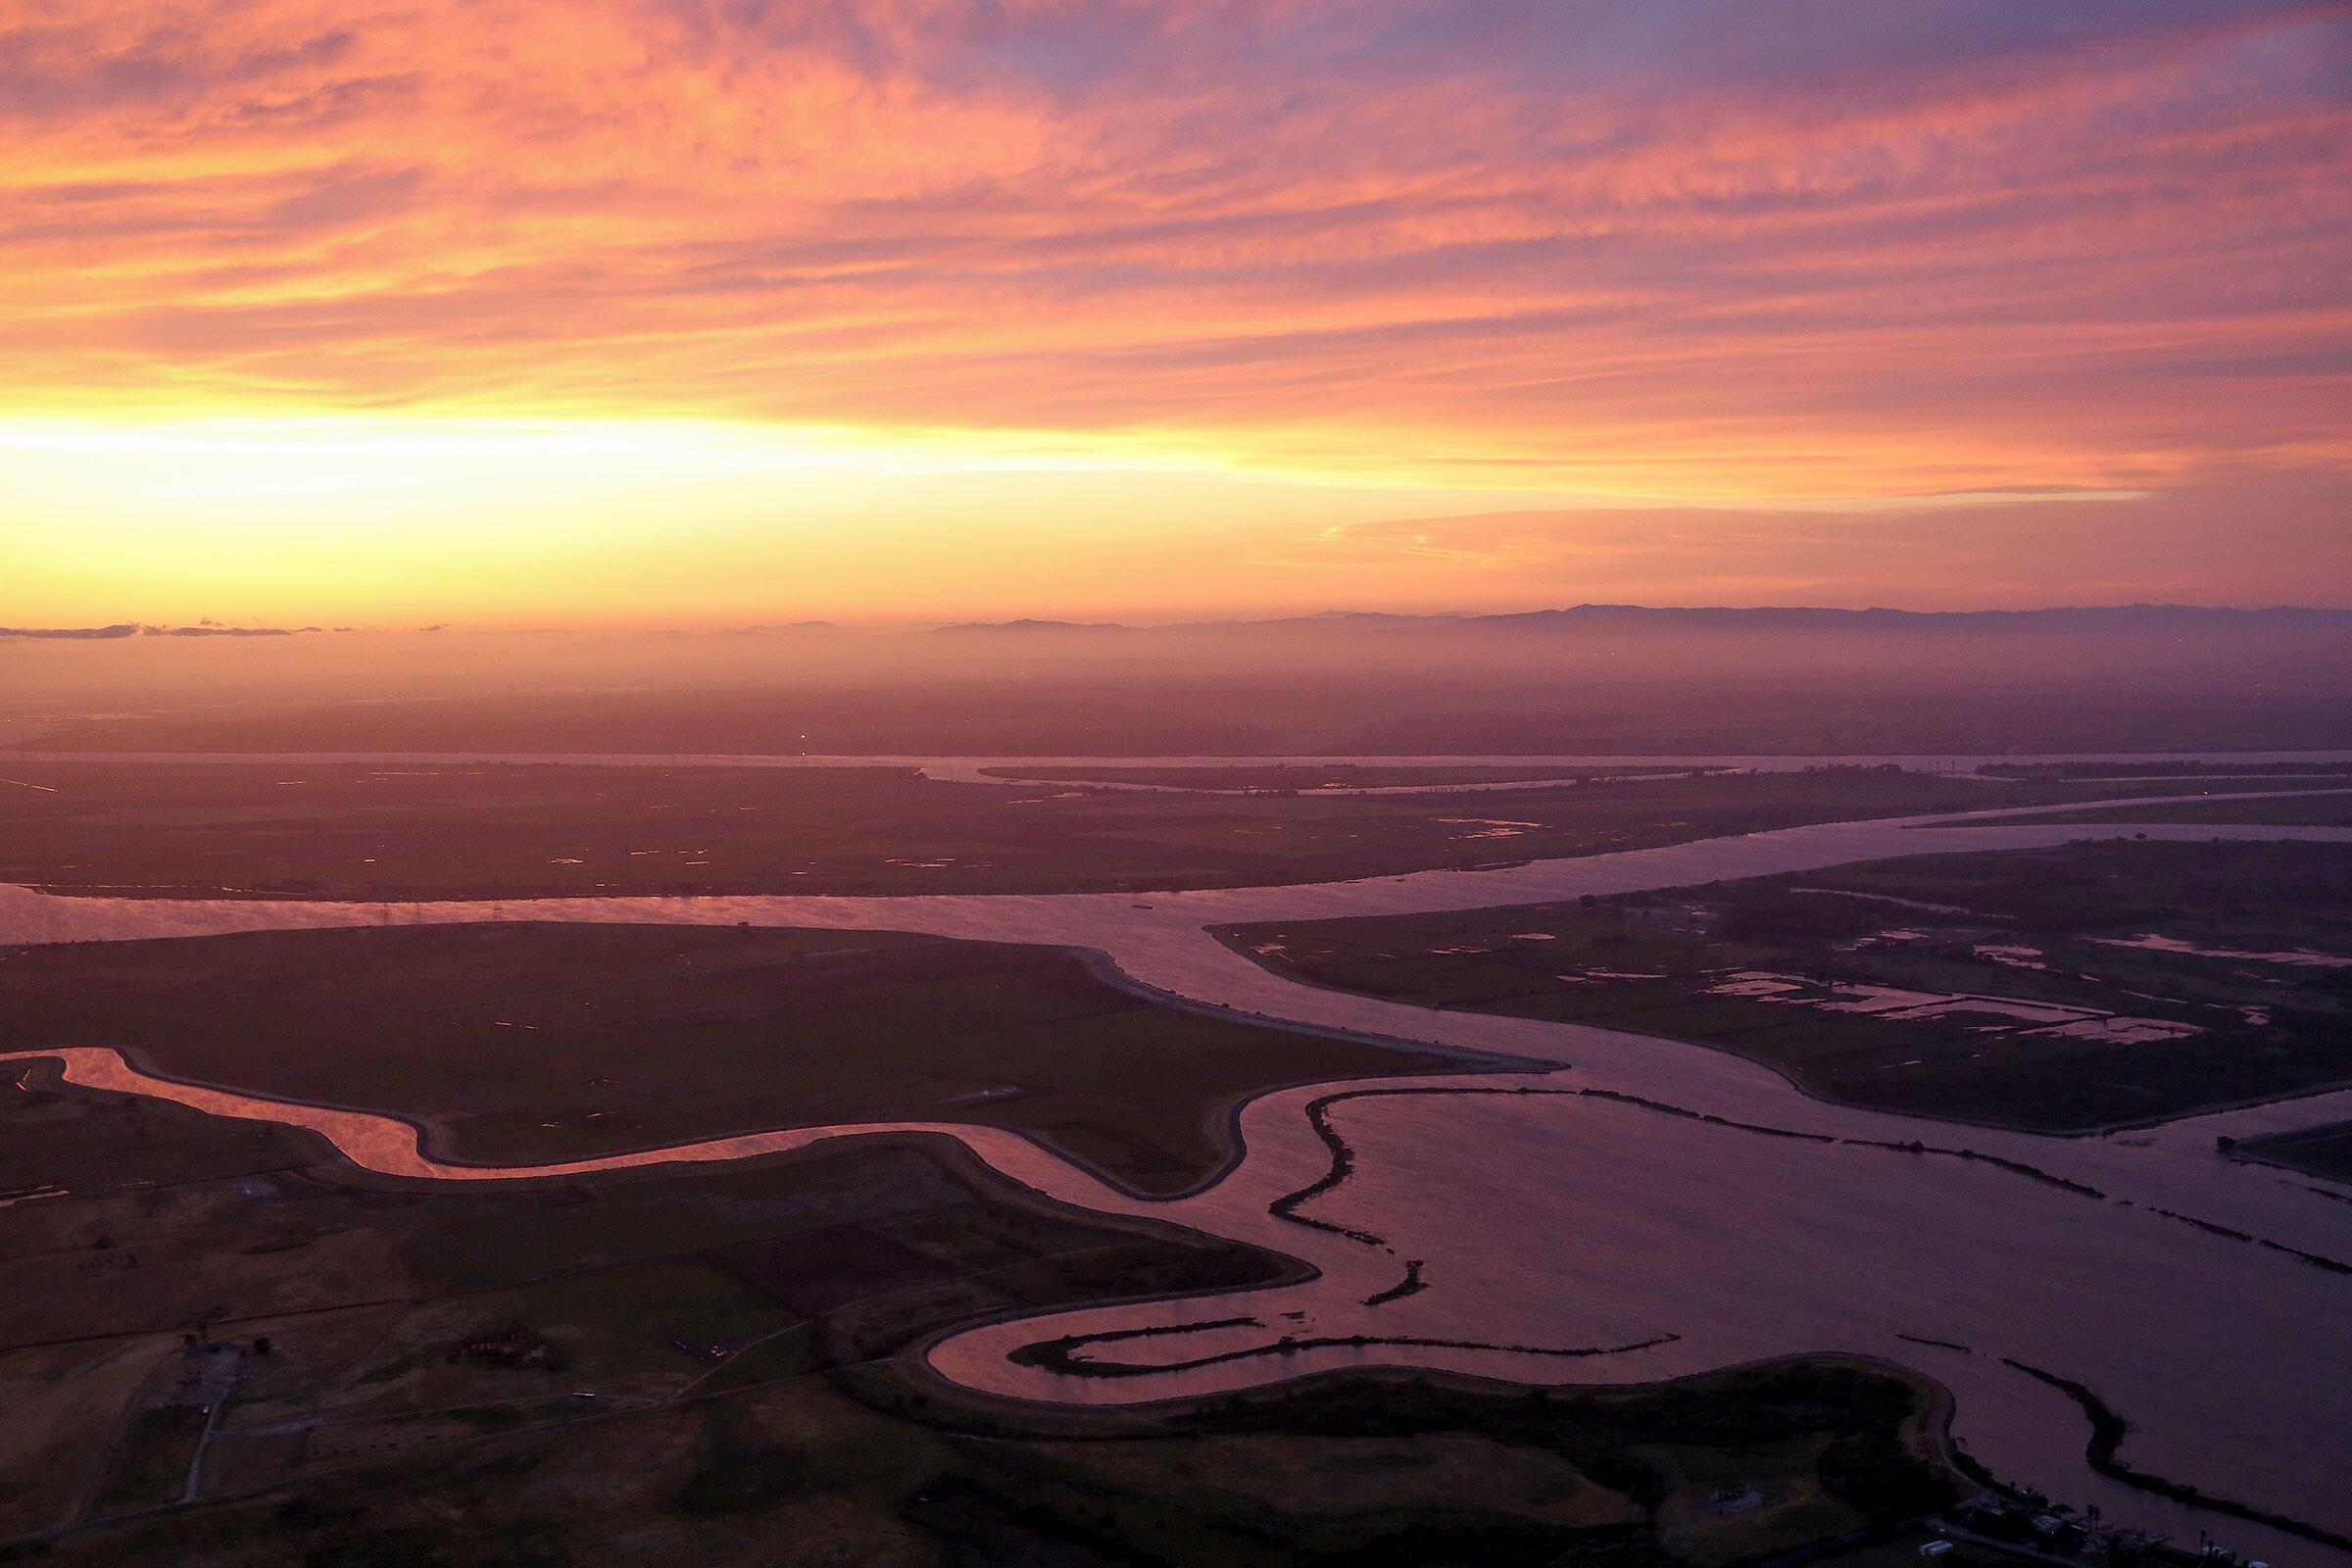 The Sacramento-San Joaquin Delta, where the Sacramento and San Joaquin rivers meet. Jim Wilson/The New York Times/Redux